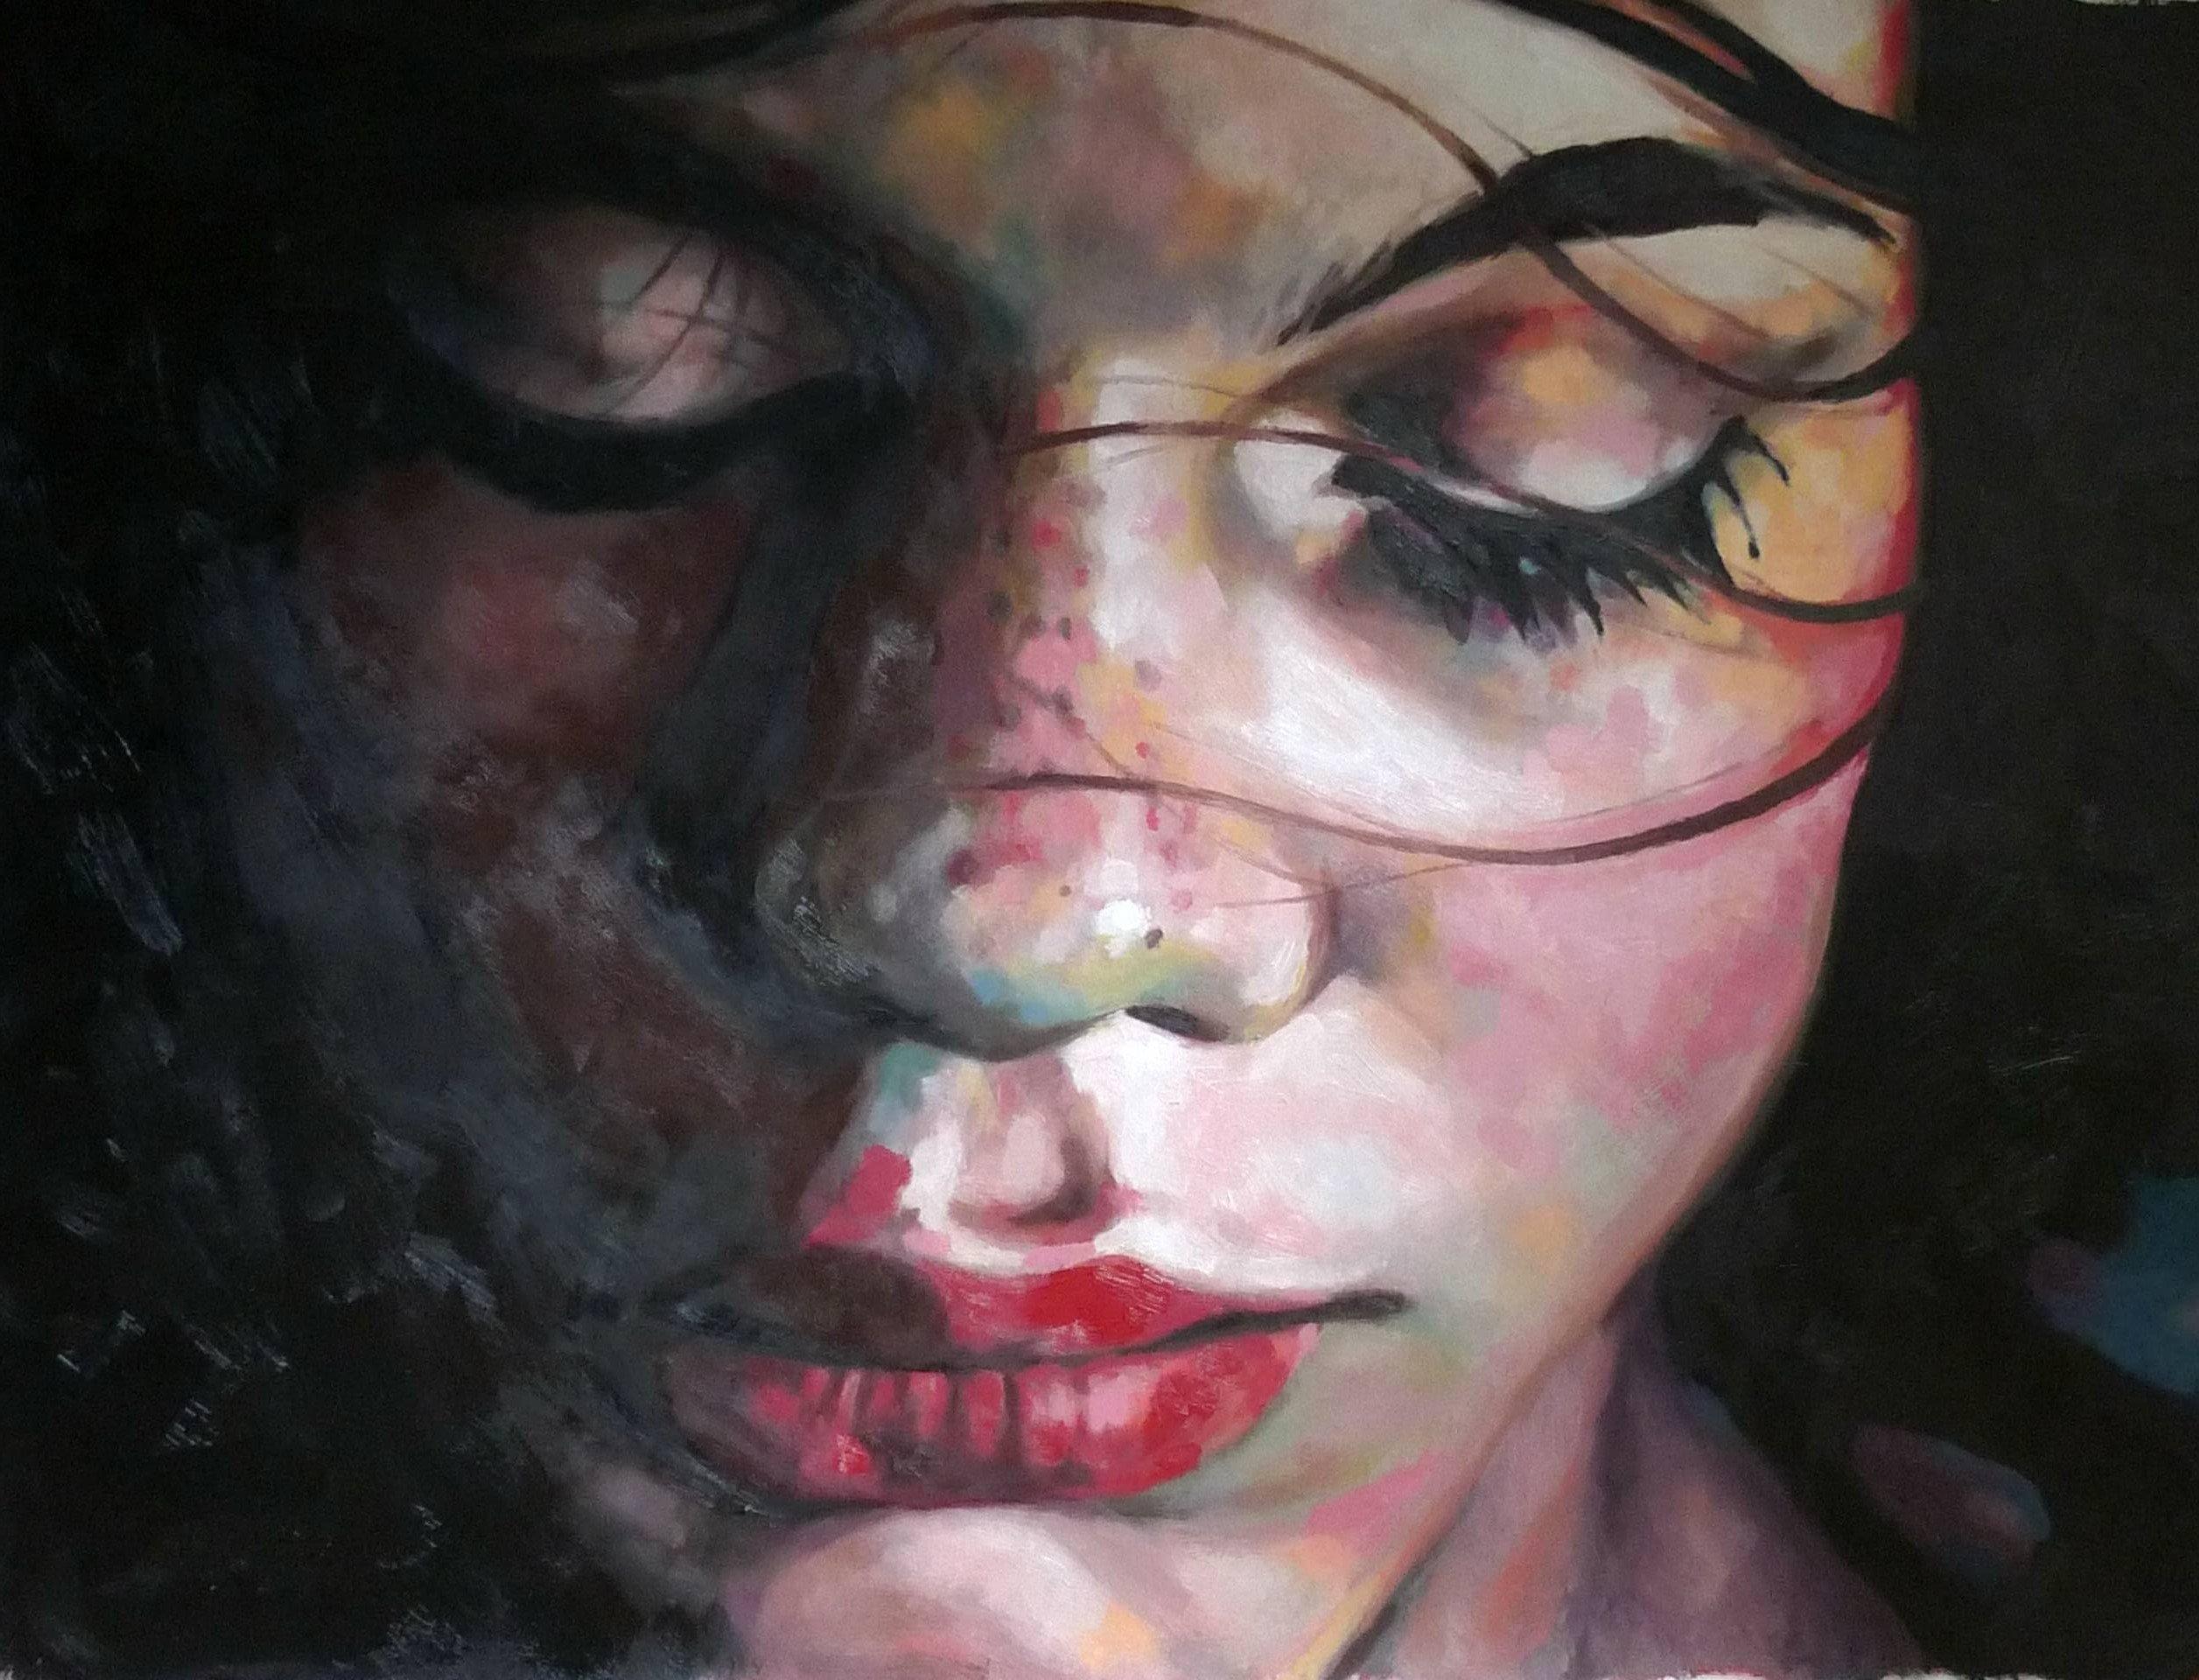 Wallpaper Of Sad Girl In Rain Art Artist Thomas Saliot Oil Painting Close Up Girl